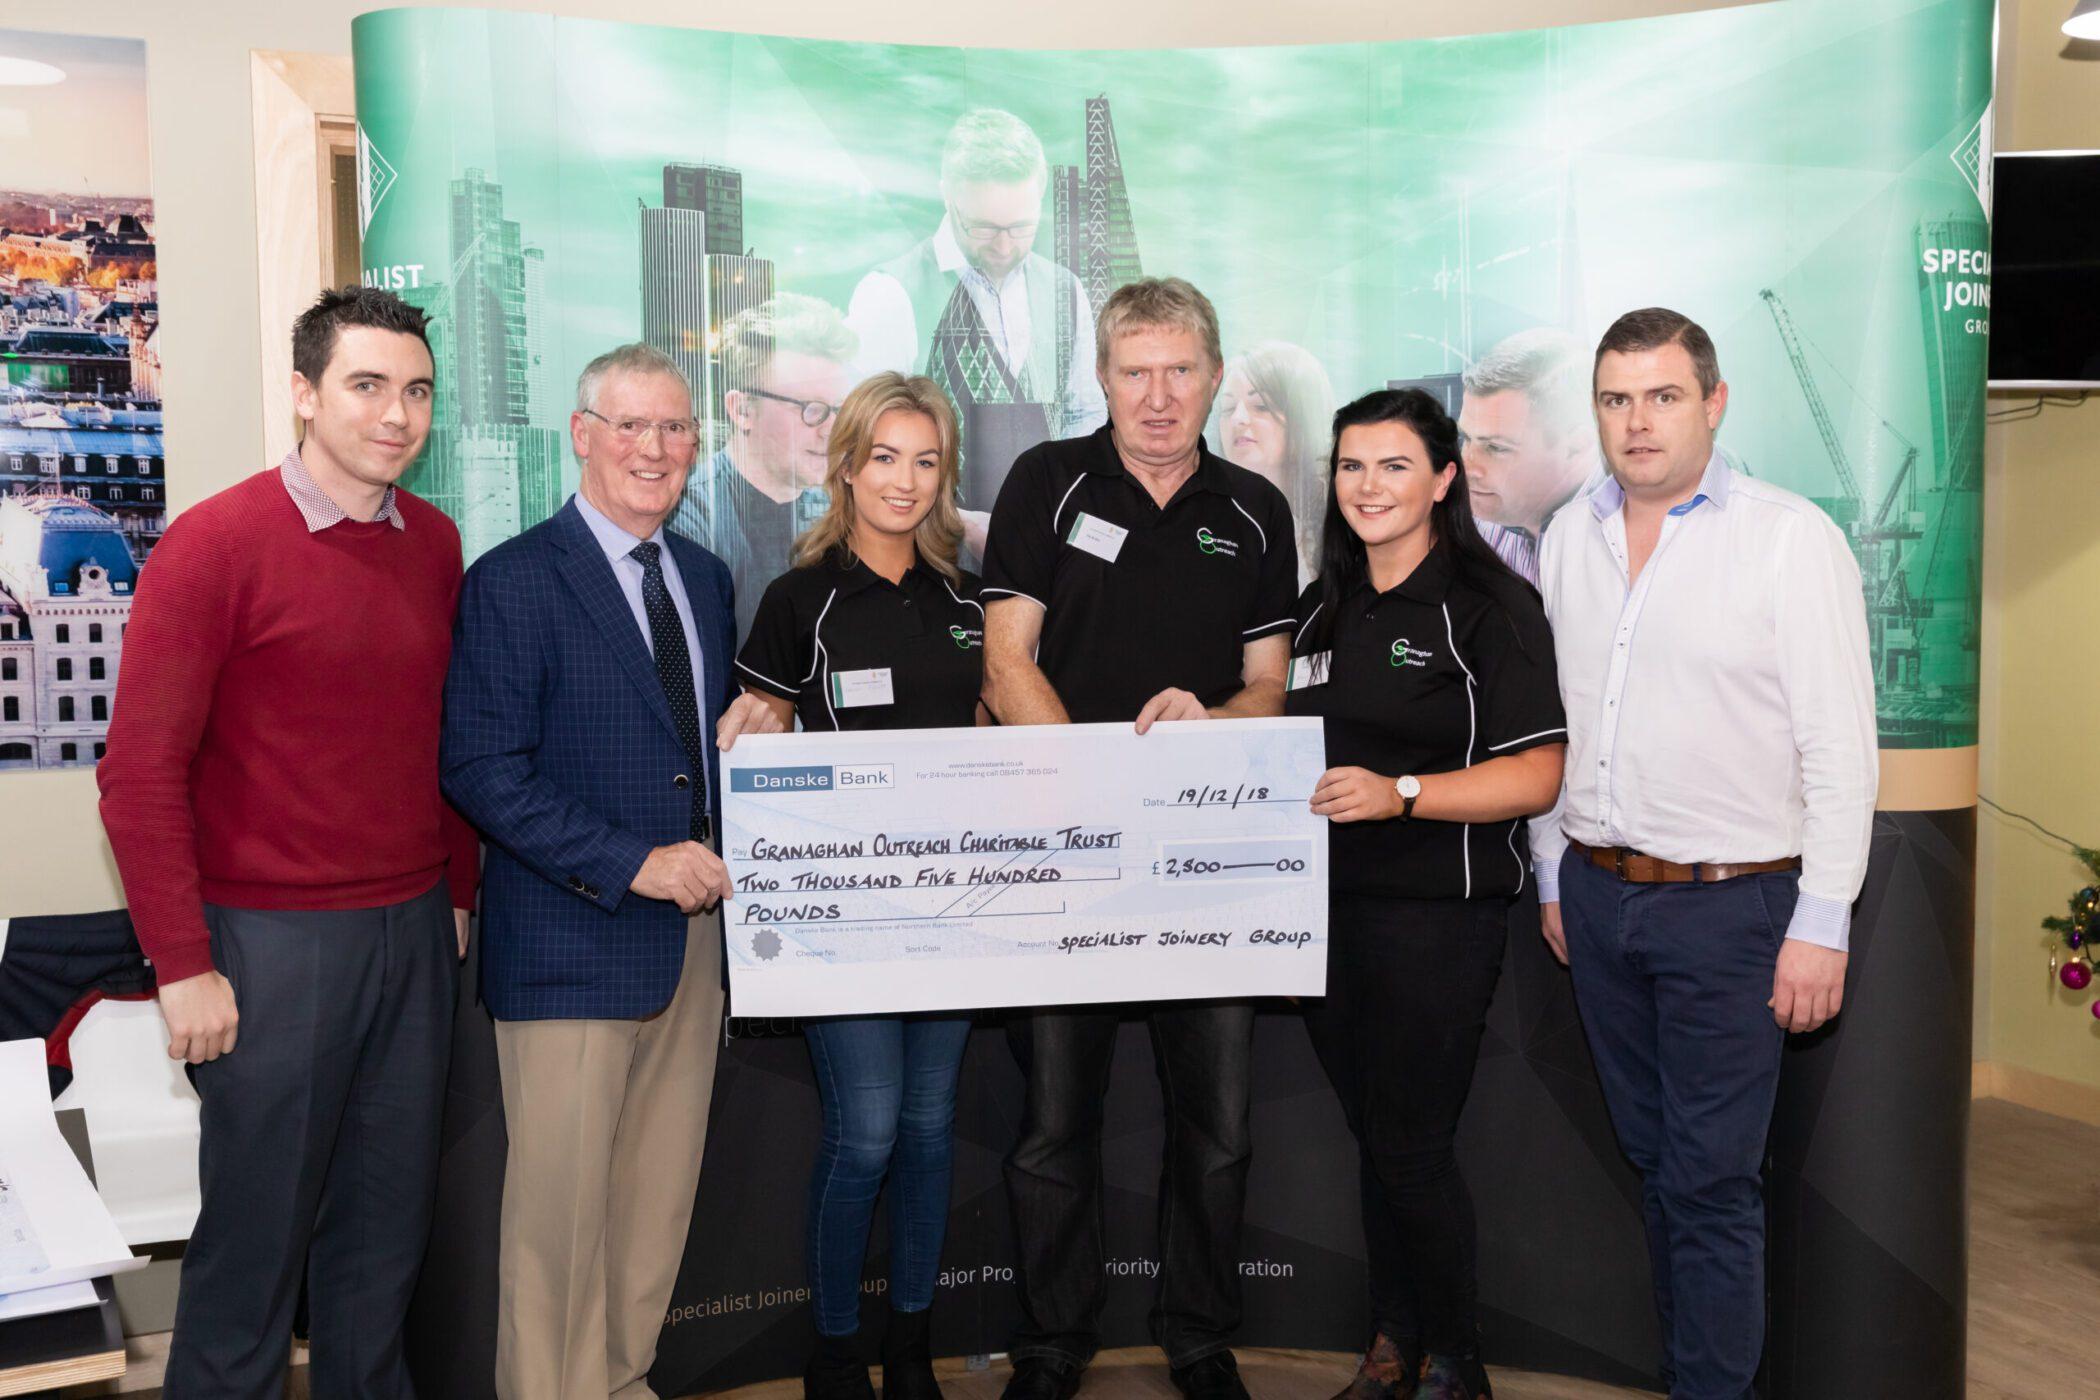 Lauren Elliott, Pat Mullan and Maeve Quinn from Granaghan Outreach pictured with Dermot, John Bosco and Ciaran O'Hagan